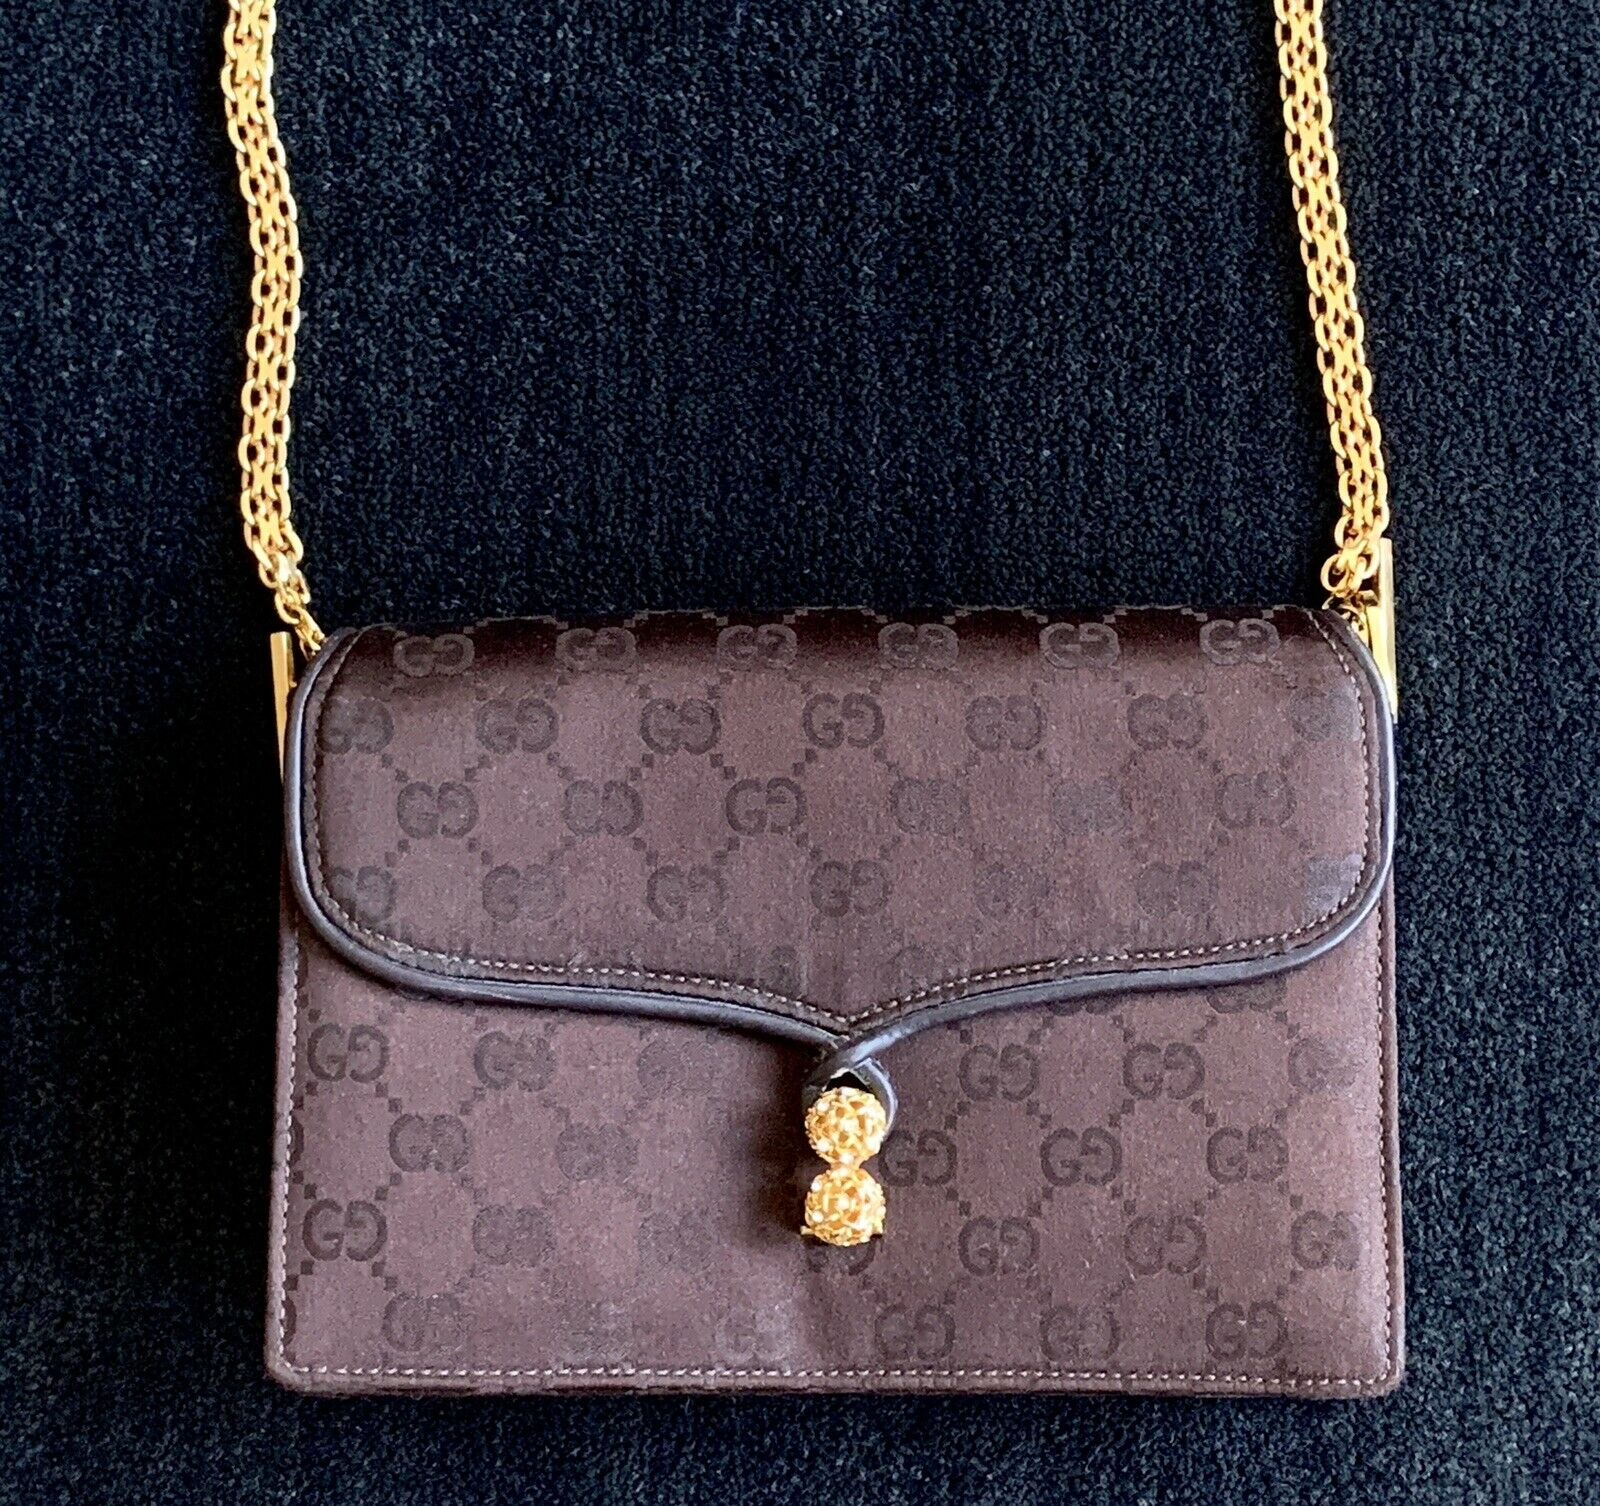 Gucci Vintage Classic Handbag with original box  - image 4